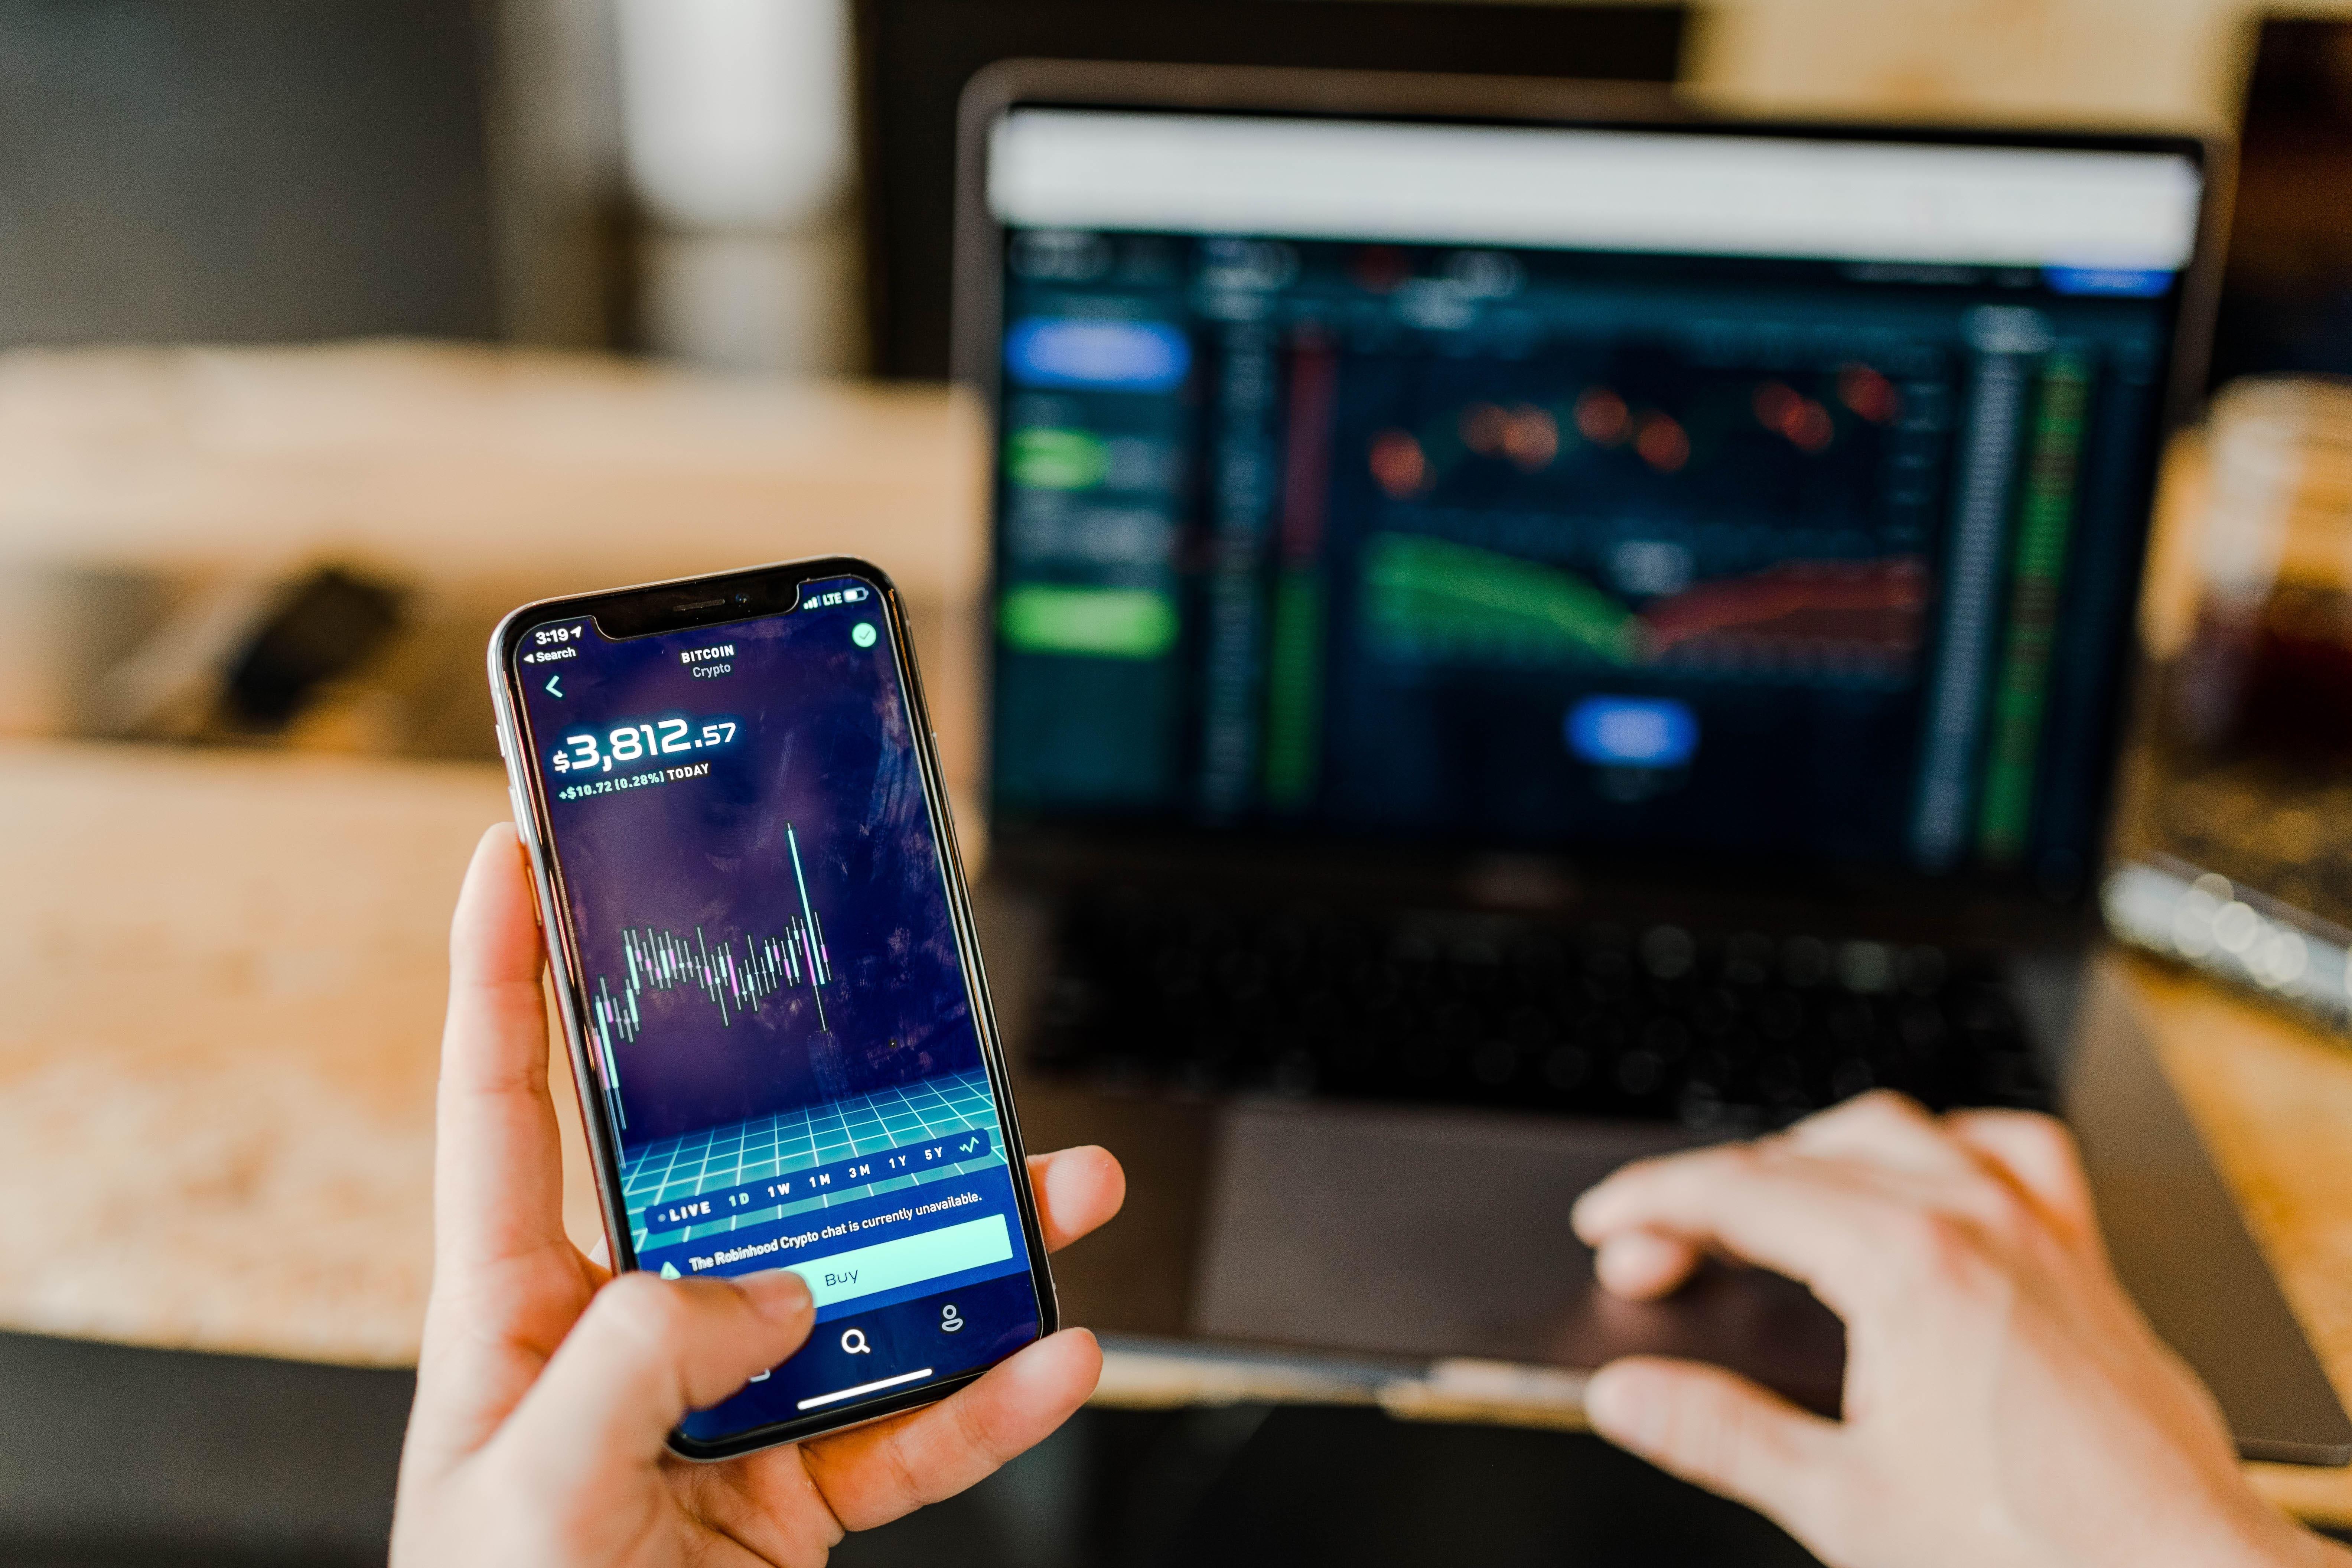 stock-market-robo-advisor-phone-with-mac-laptop-velox-clearing-pexels